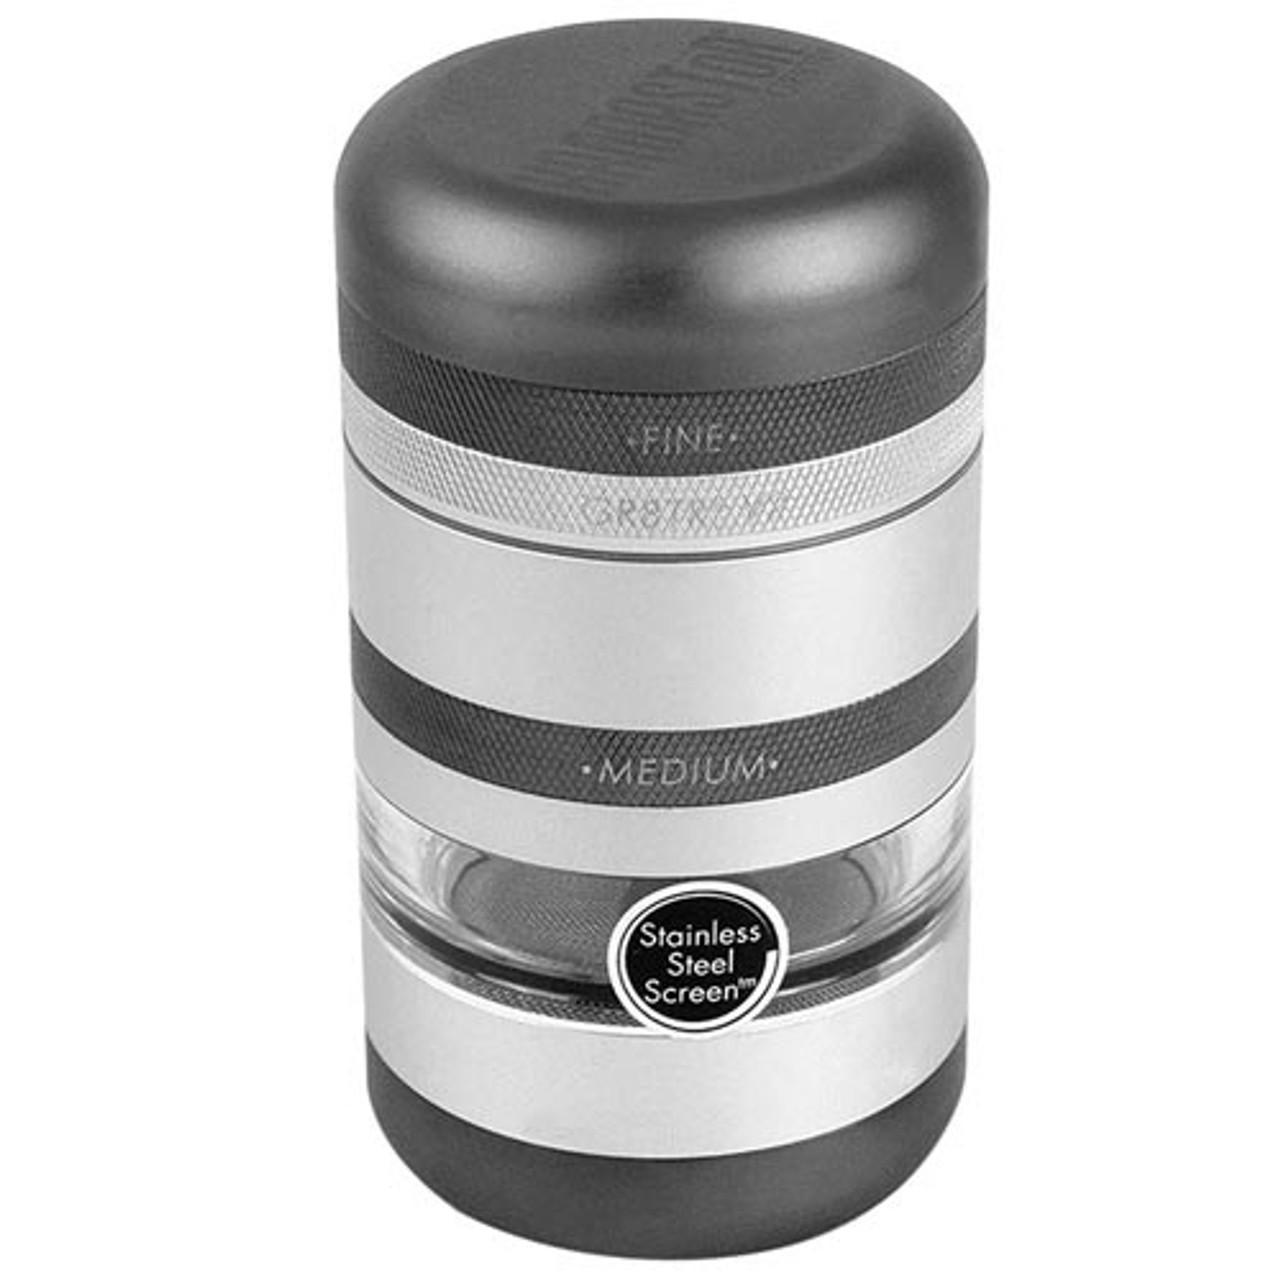 Kannastor GR8TR V2 Series Grinder - Jar Body